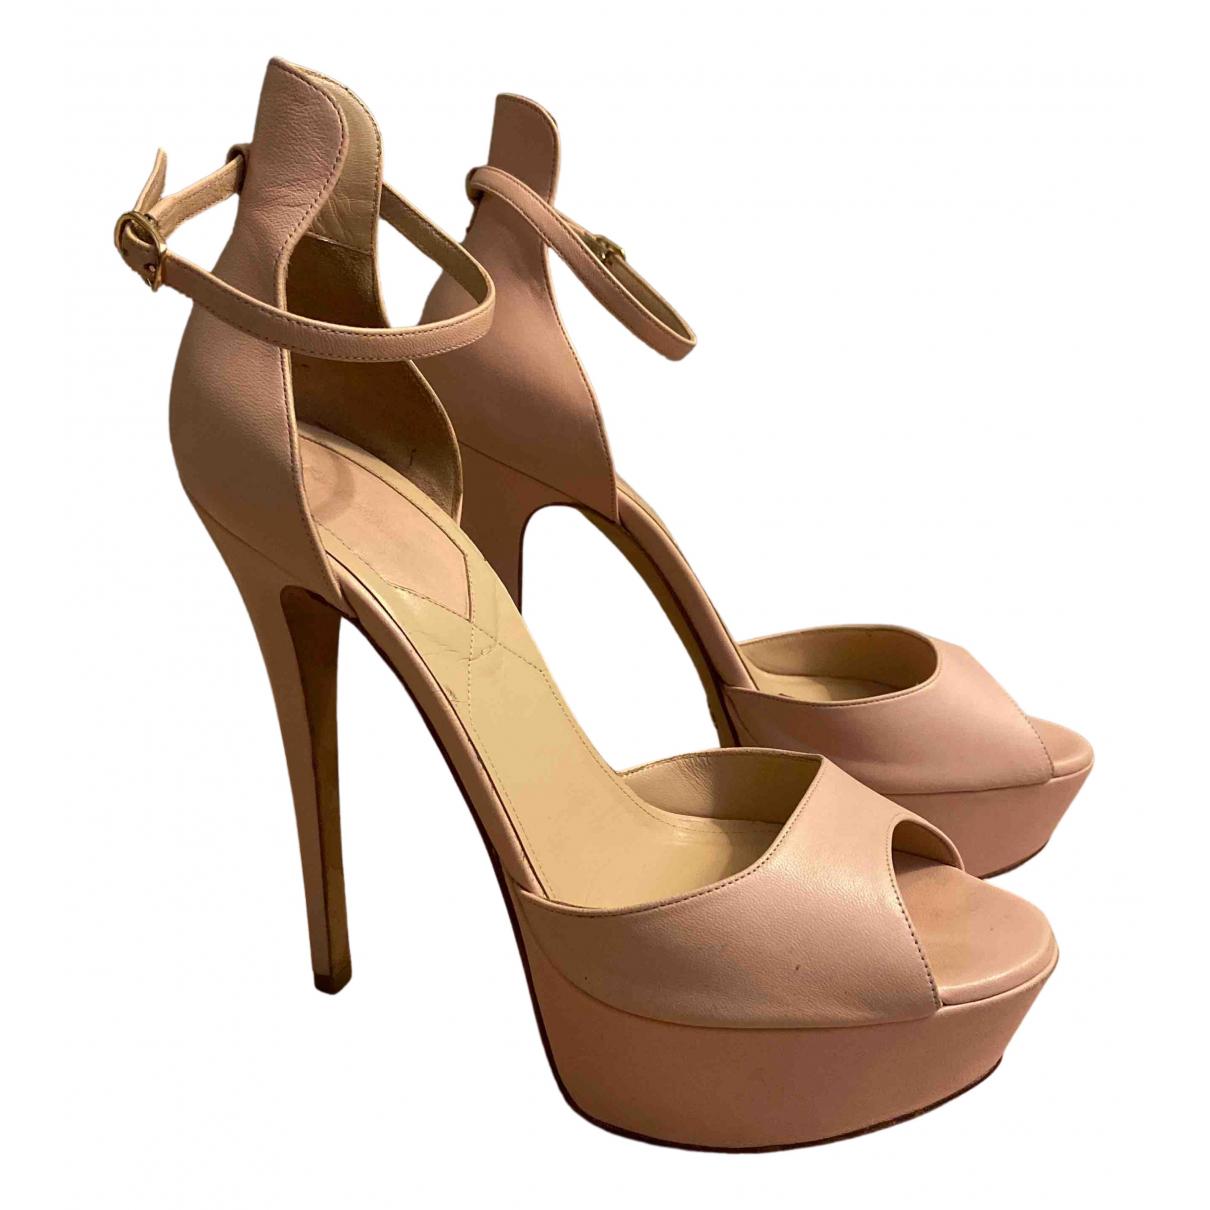 Elie Saab - Sandales   pour femme en cuir - rose